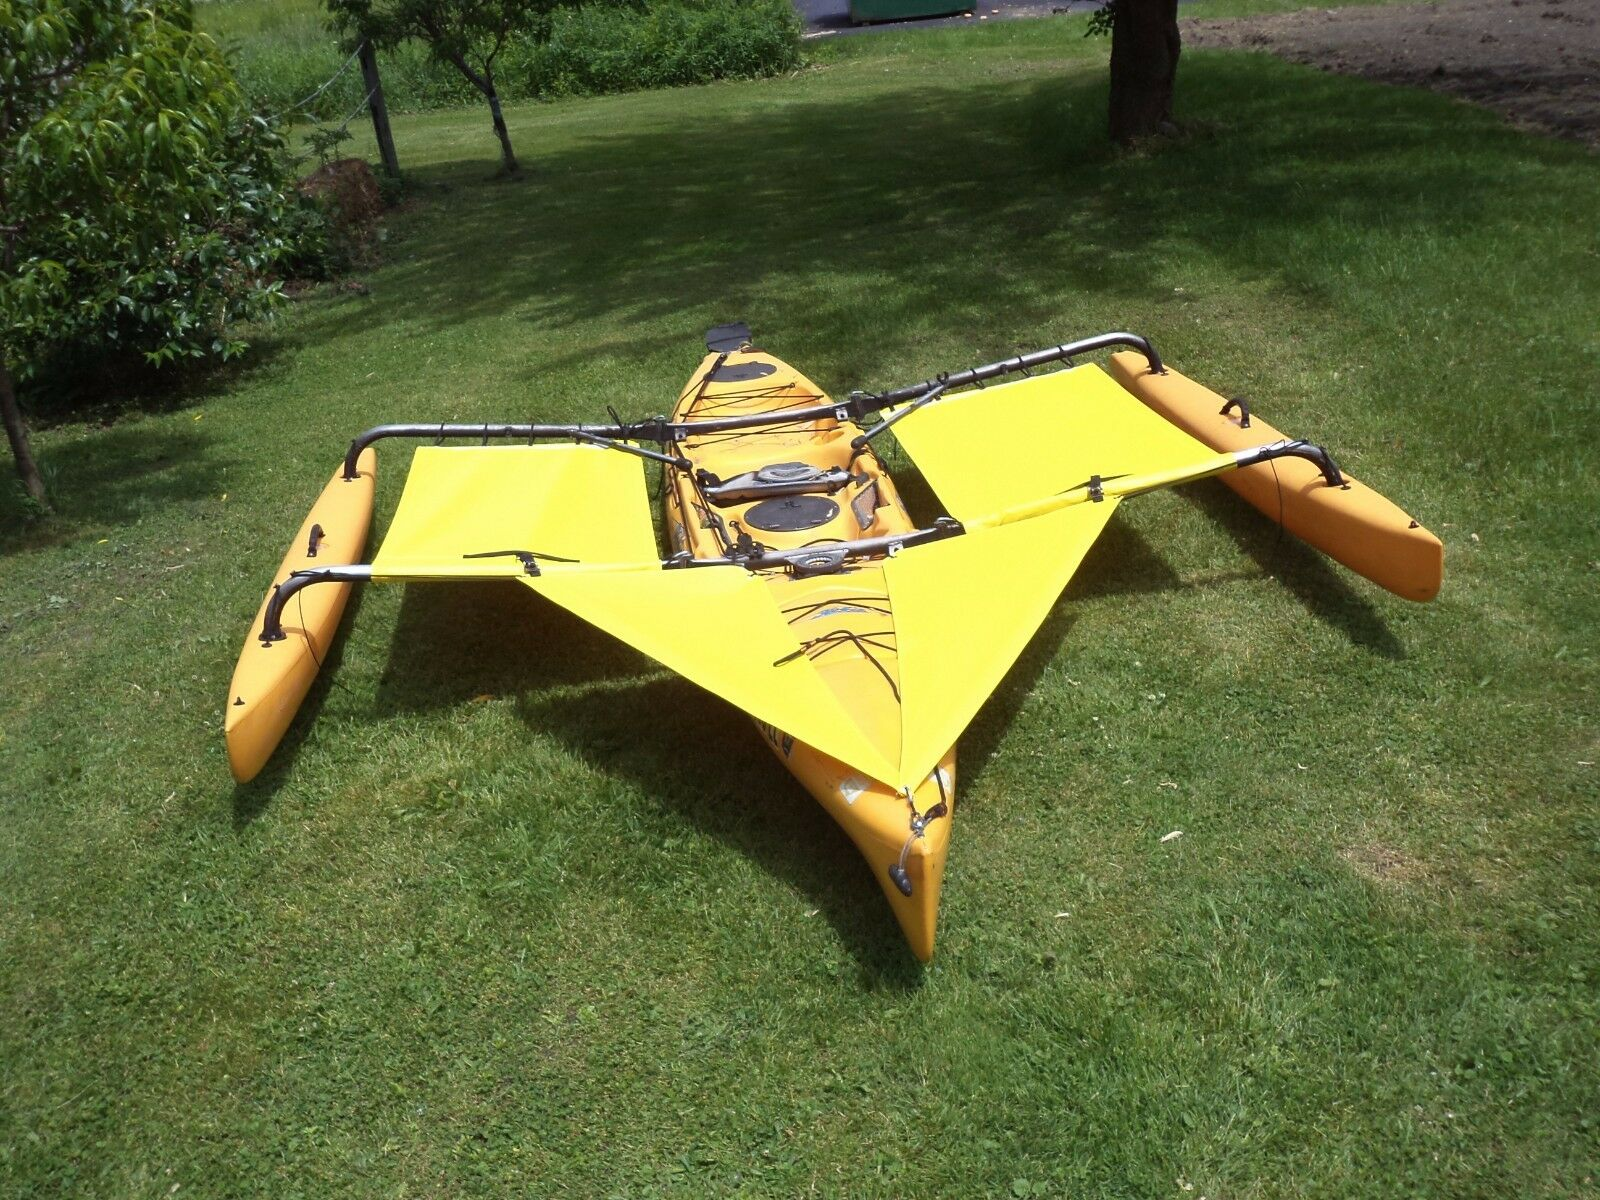 Hobie Adventure Island Kayak Trampoline & splash shield Gelb 2014 & earlier